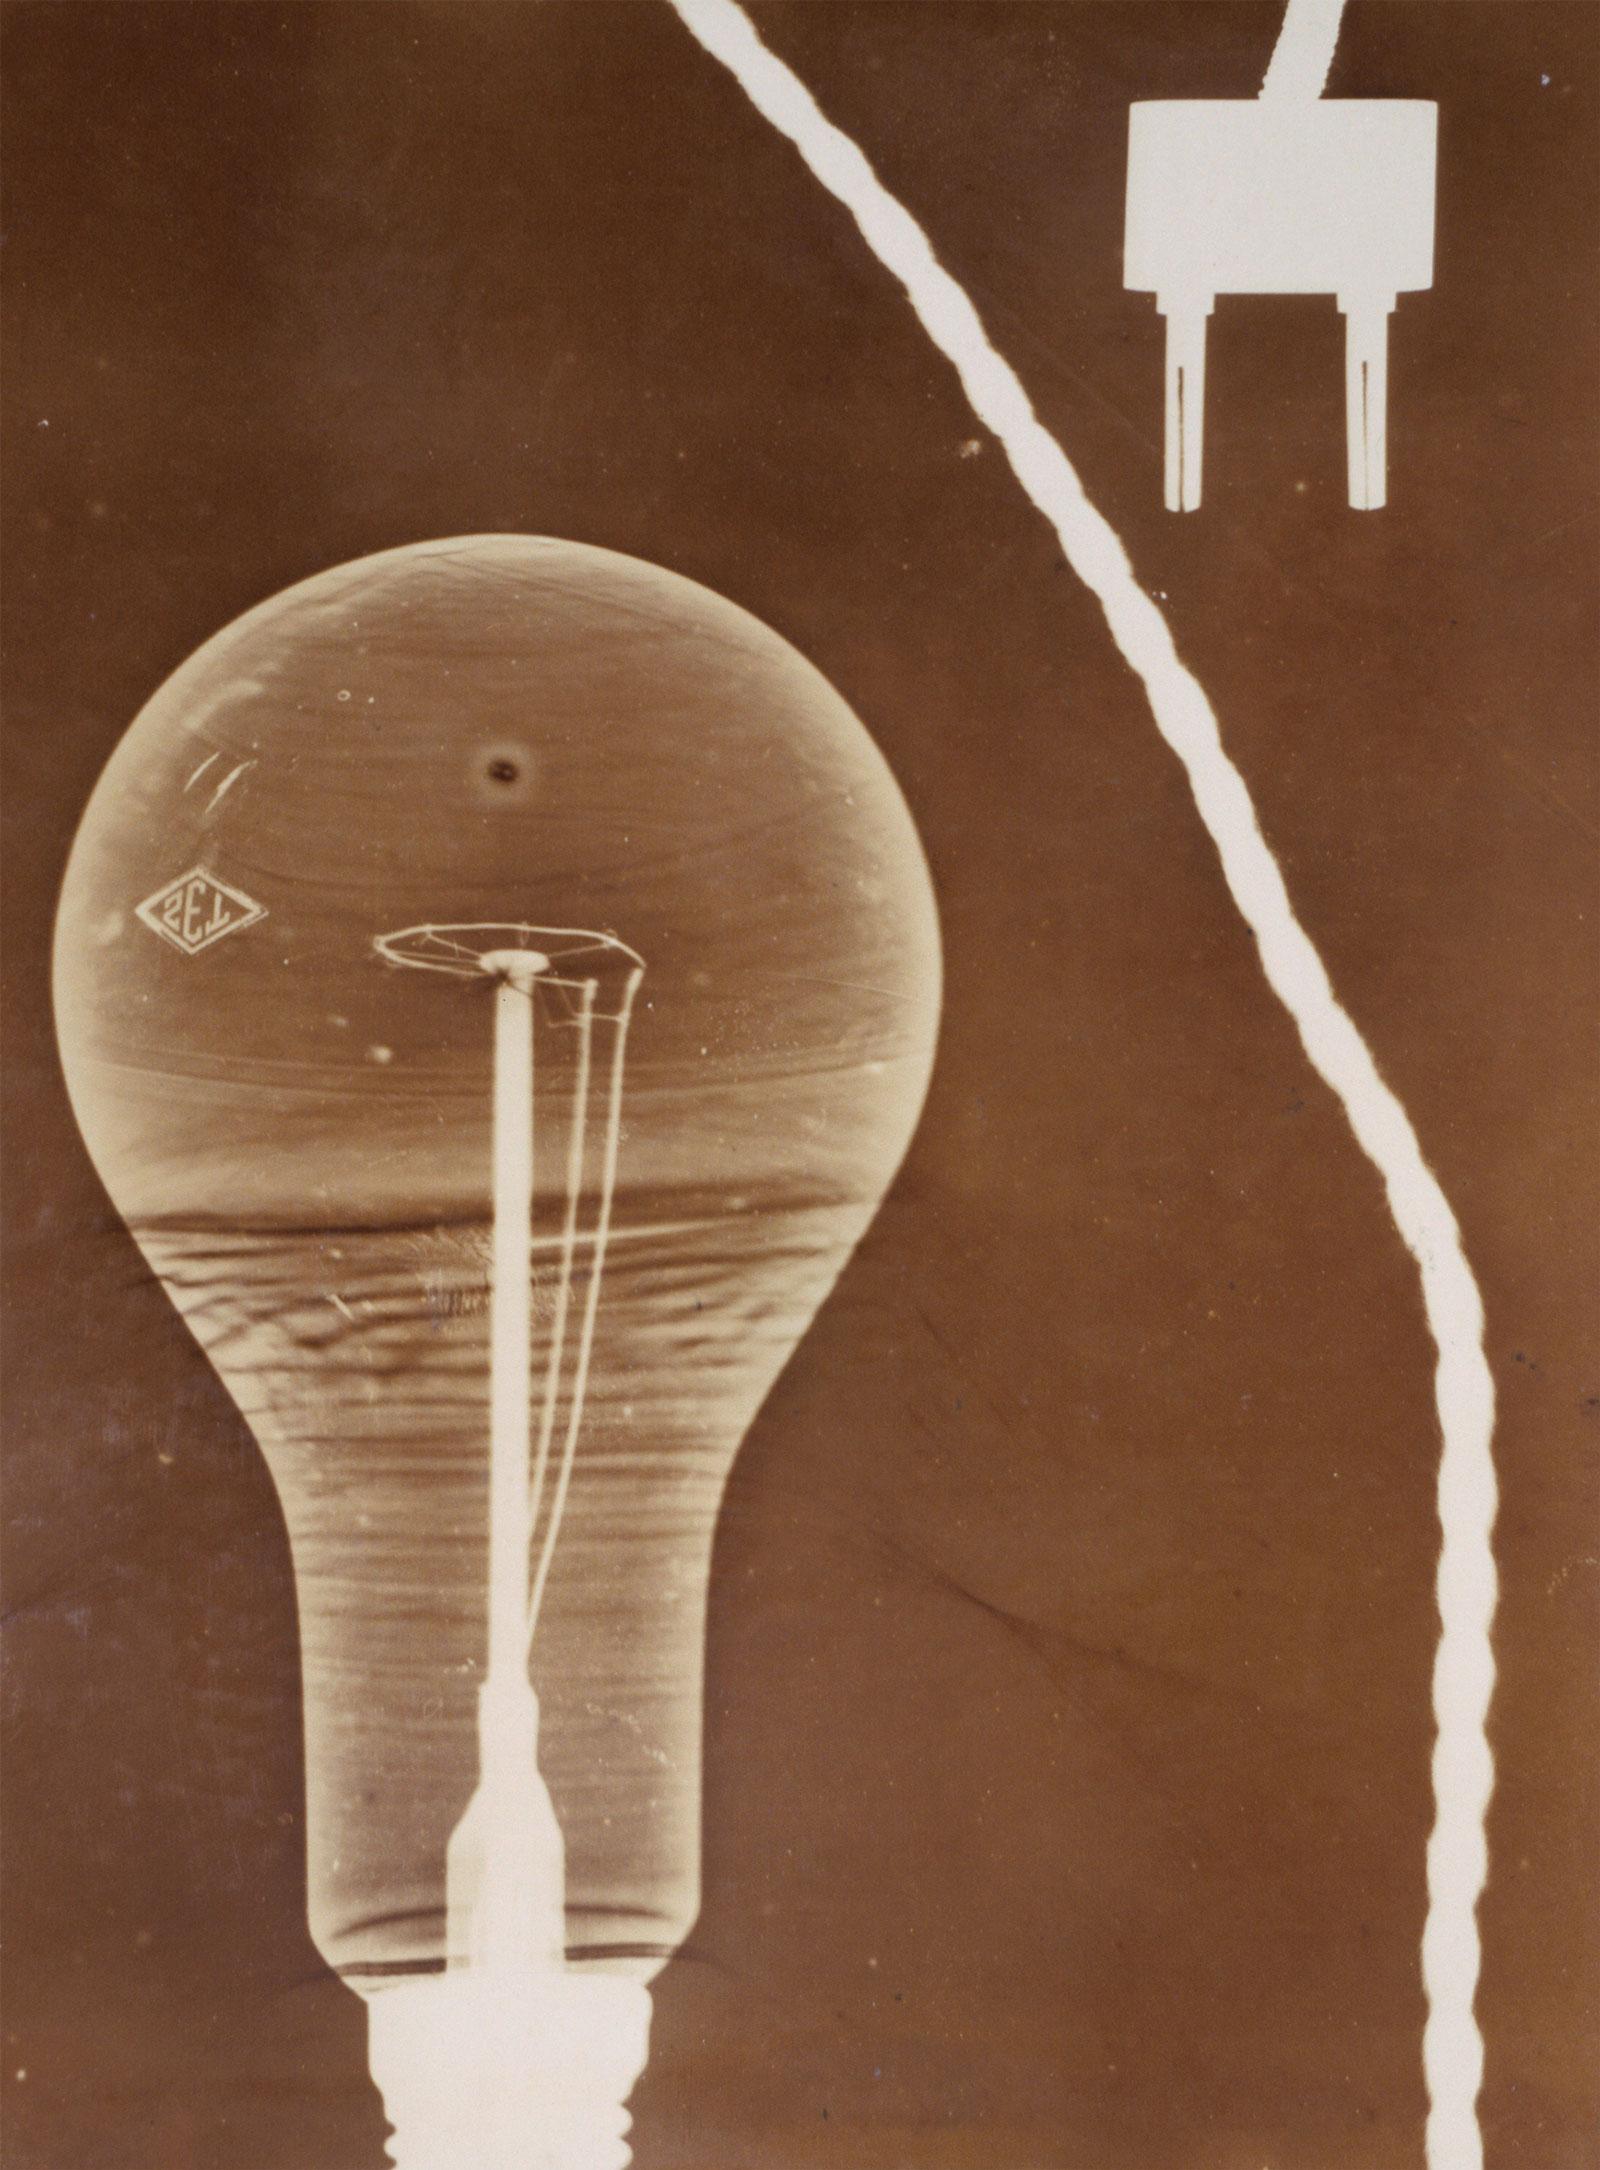 Georgy Zimin: Still Life with Light Bulb, 1928-1930